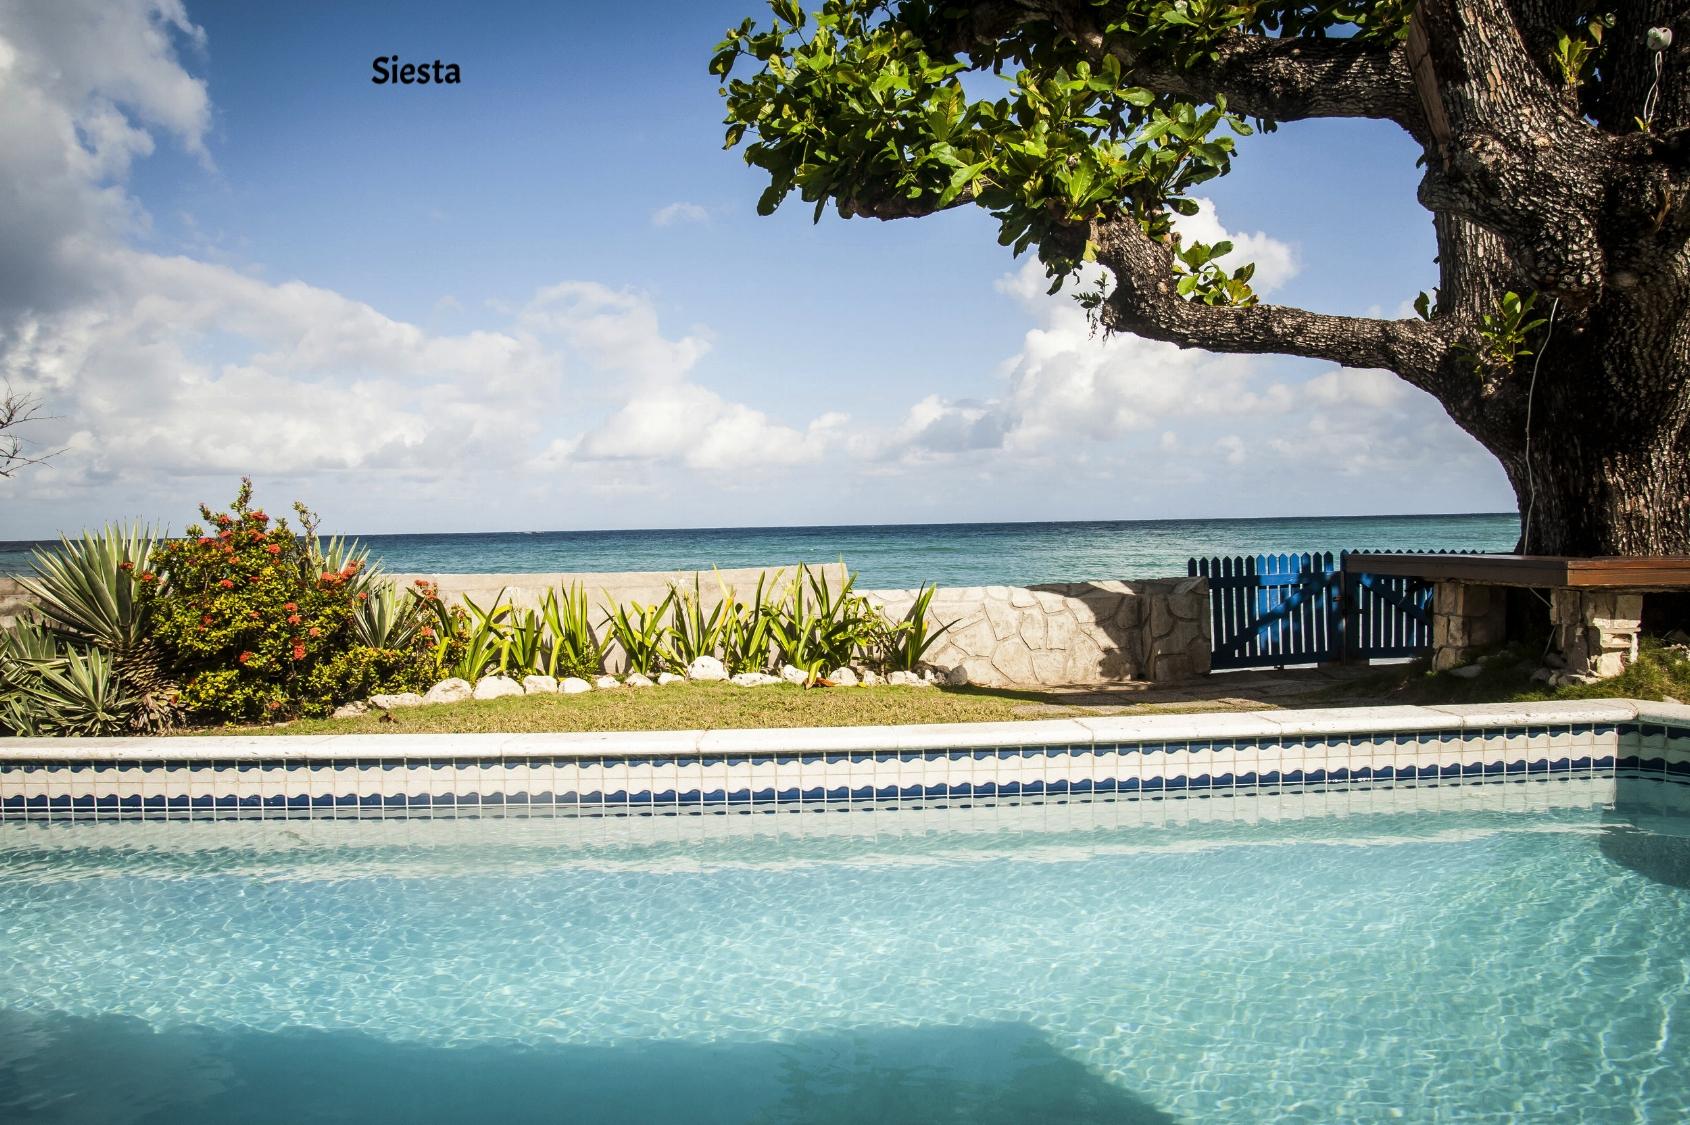 Siesta_Runaway_Bay_Jamaica_33.JPG